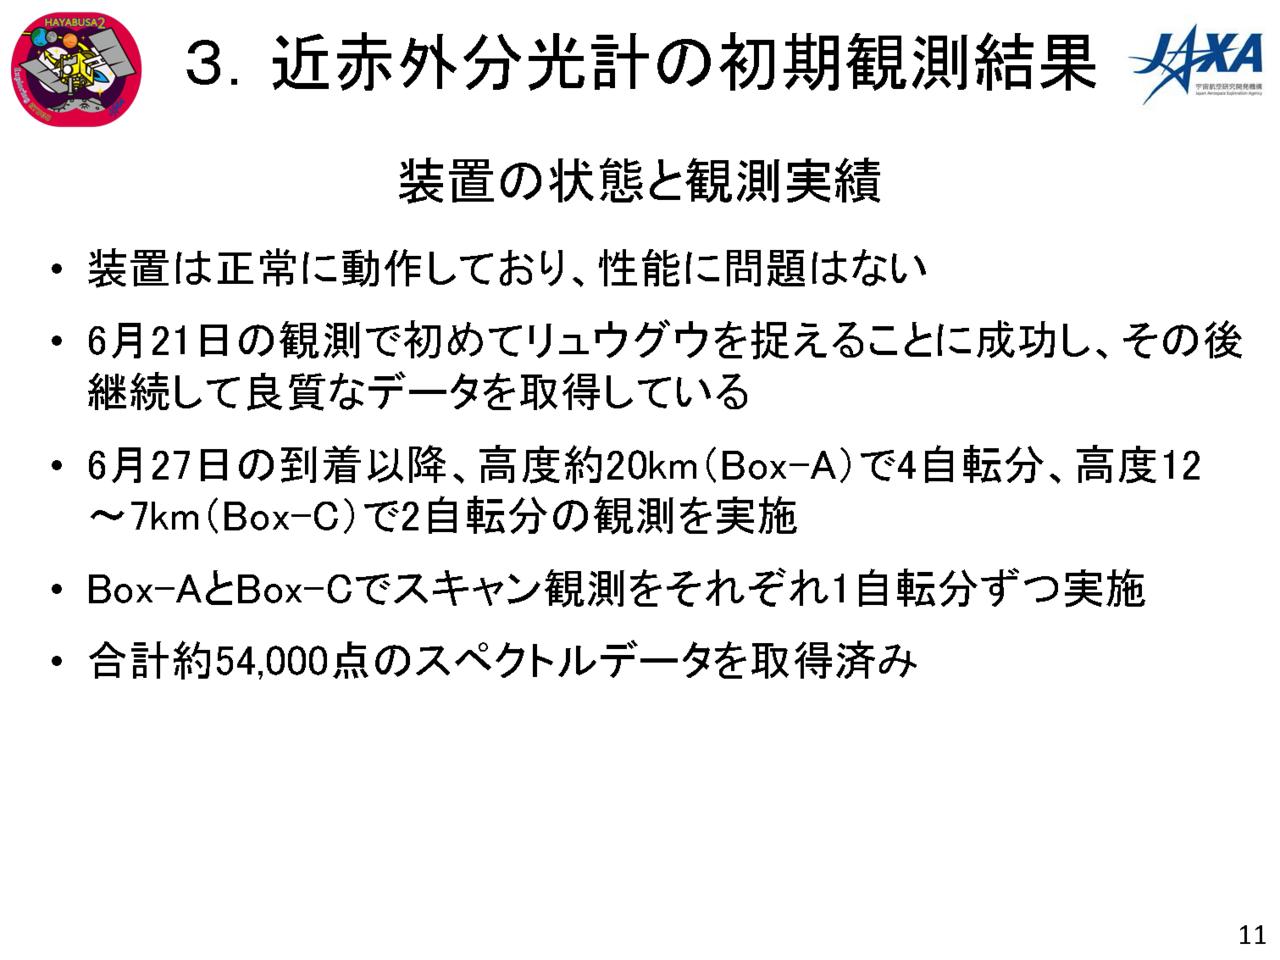 f:id:Imamura:20180802145931p:plain